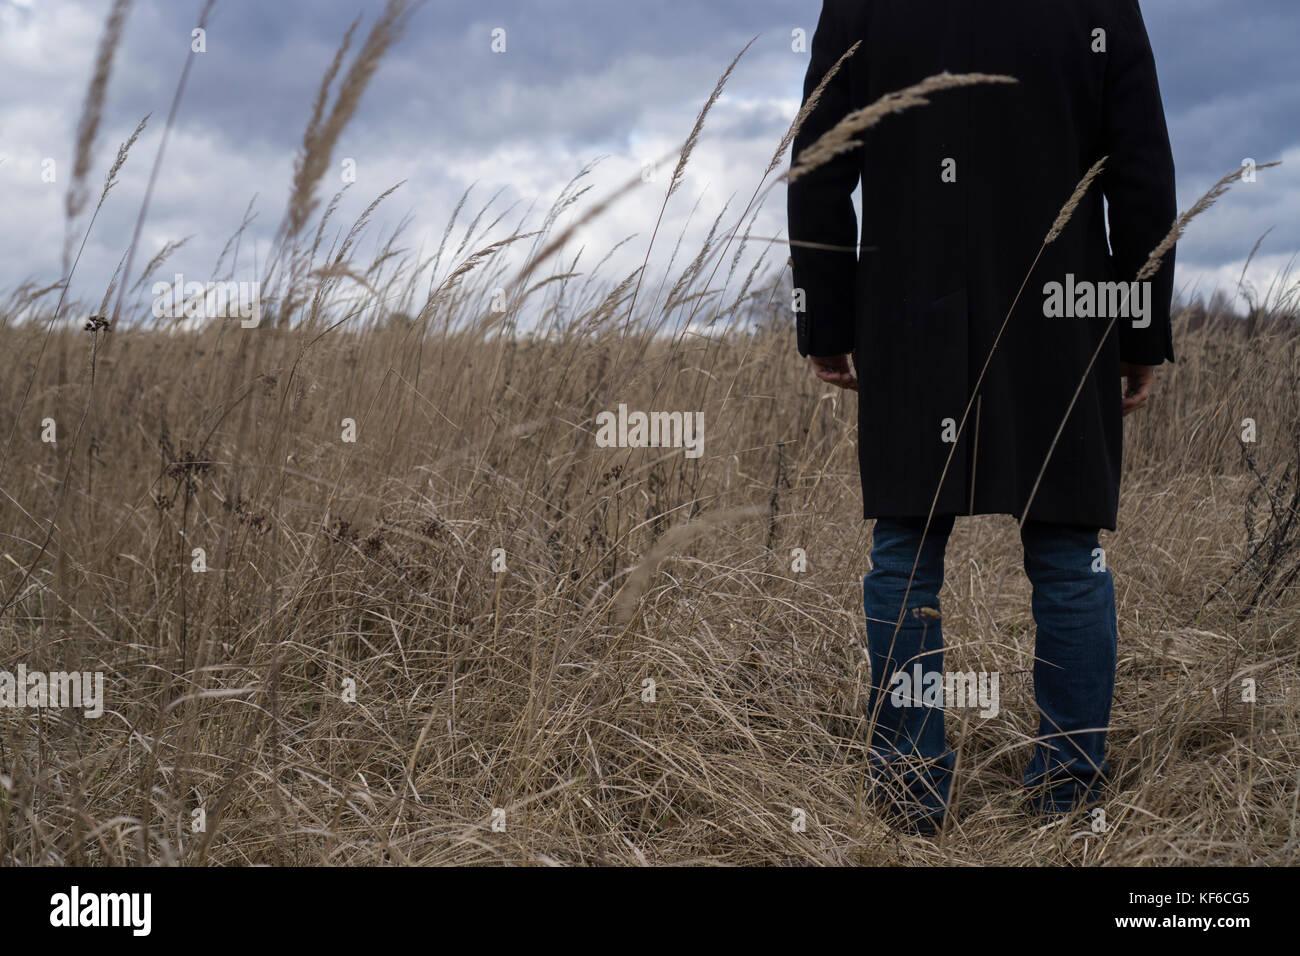 Volver Cerrar arriba de un hombre vestido con un abrigo de pie en un campo Imagen De Stock